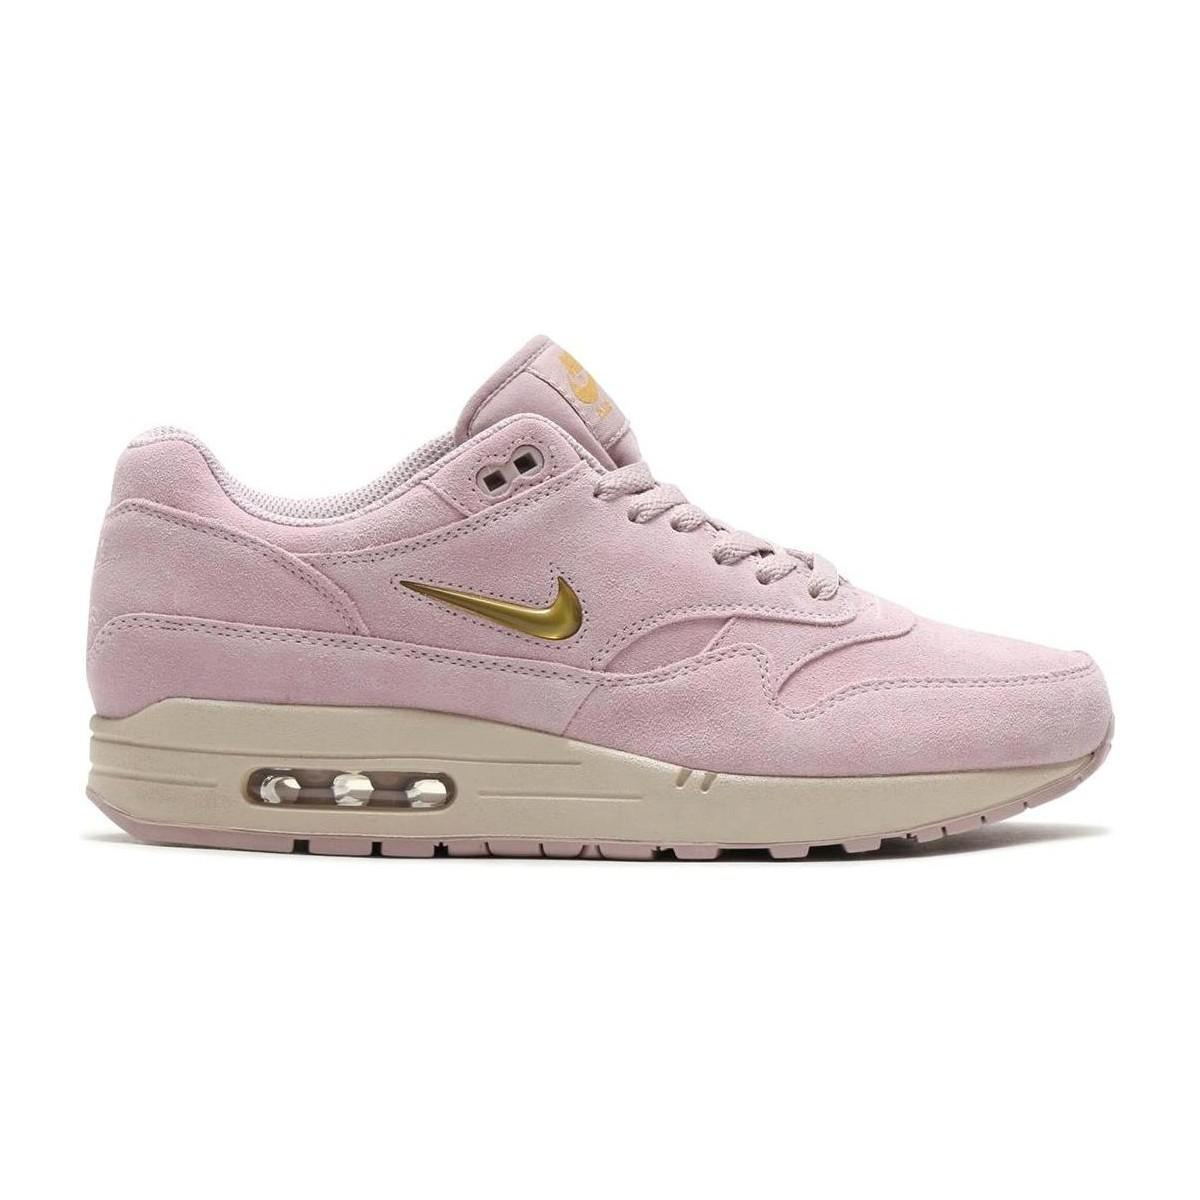 Lyst Chaussures ZAPATILLAS AIR MAX coloris 1 PRM Nike en coloris MAX Rose 105225